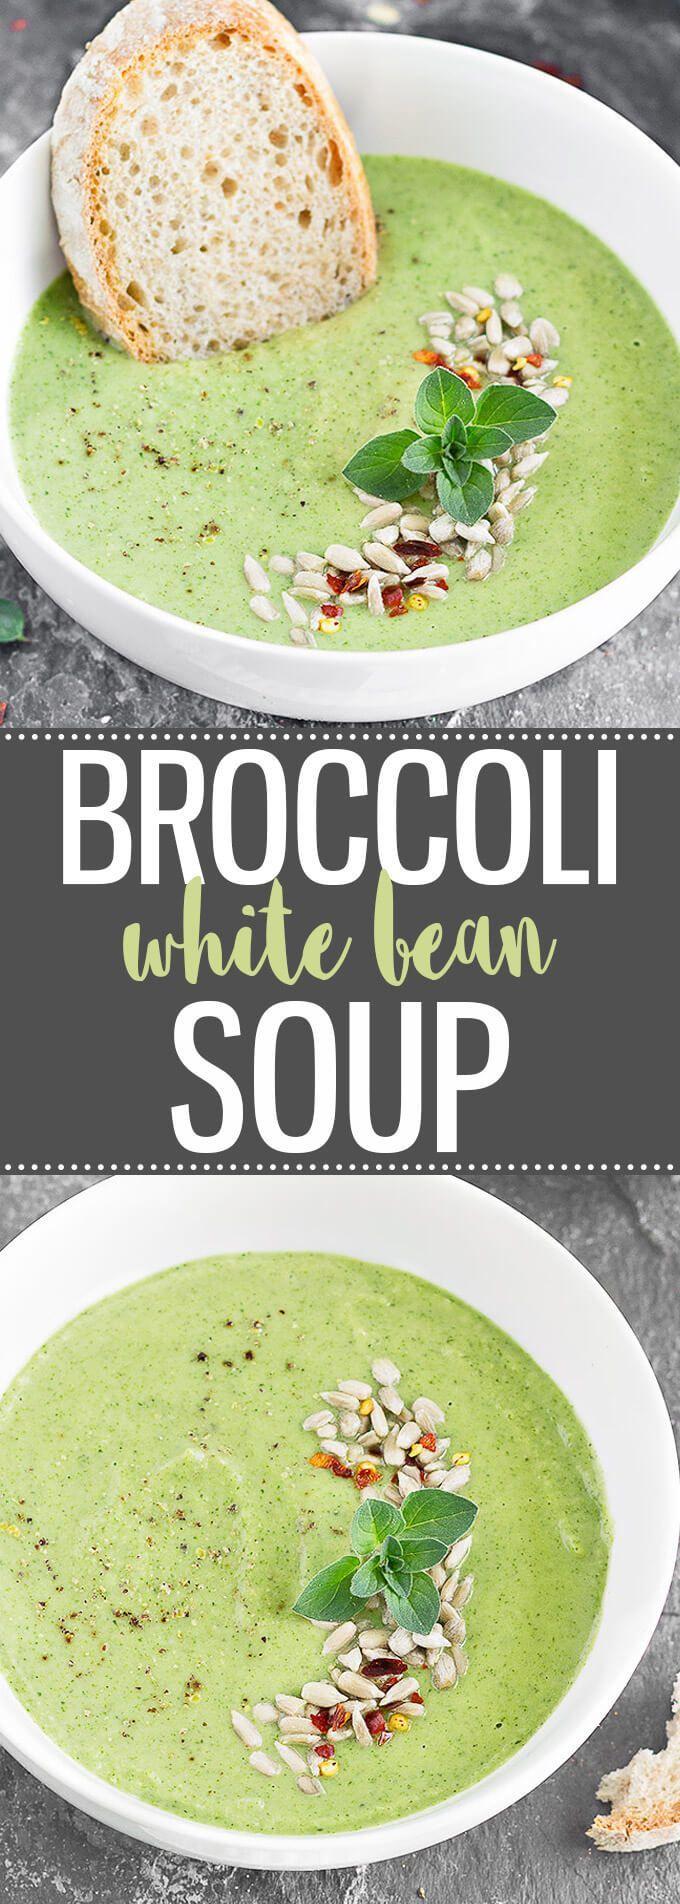 Broccoli White Bean Soup - creamy, healthy and super easy to make! (vegan + gluten-free + dairy-free) via /easyasapplepie/